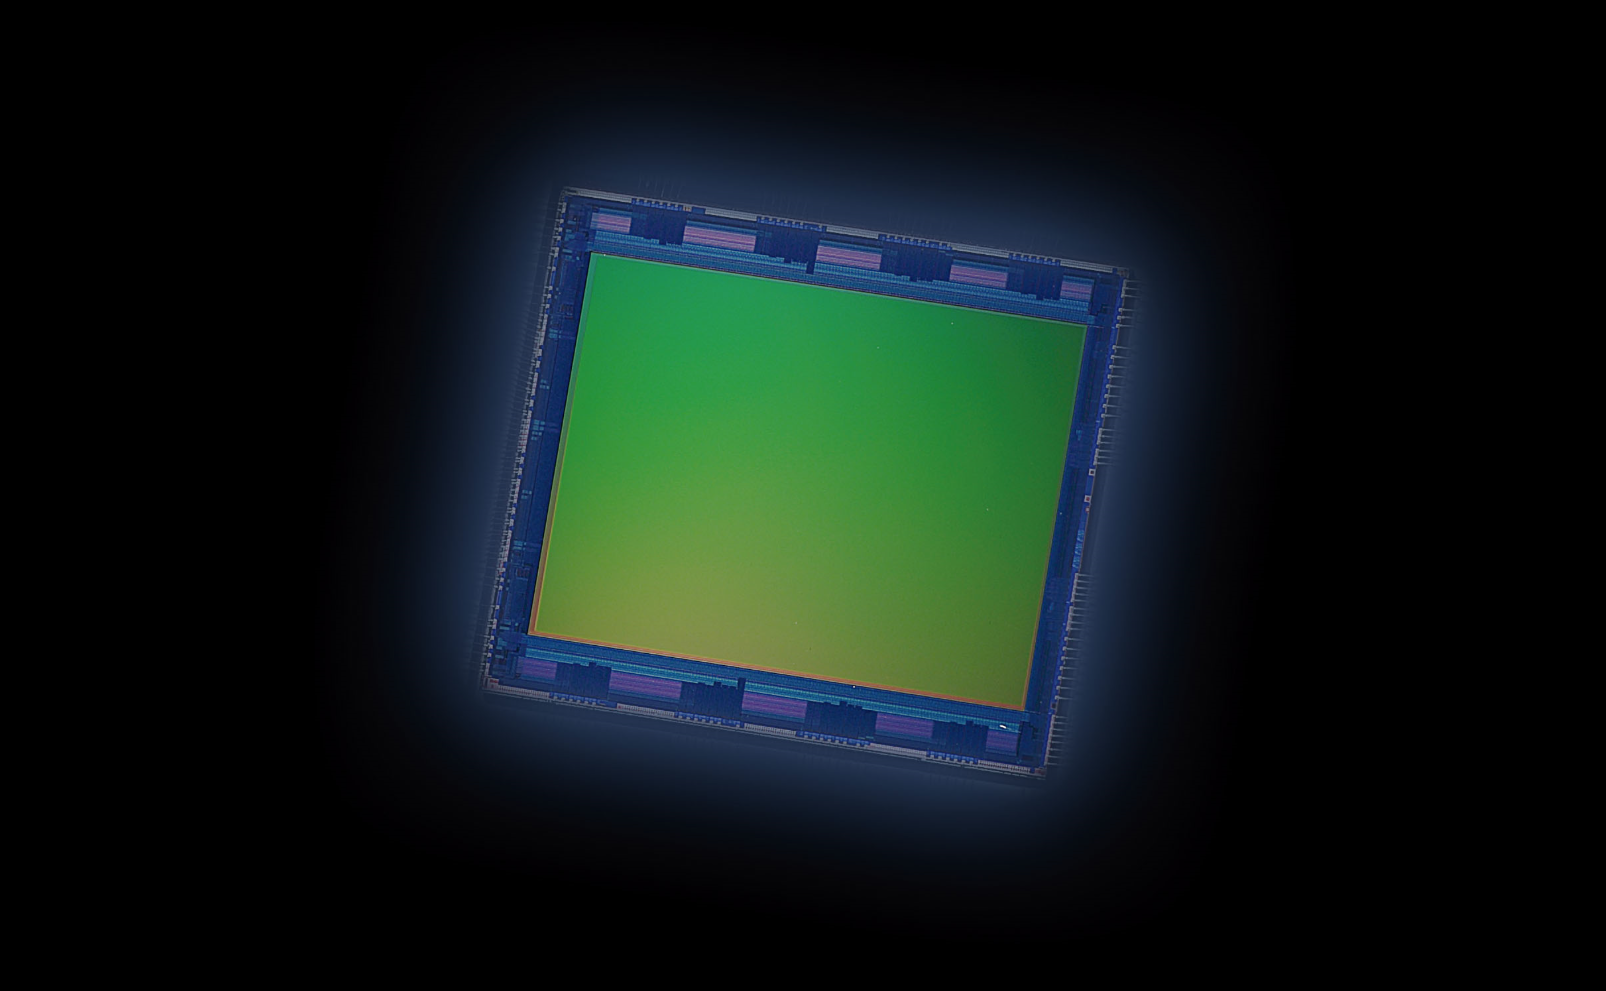 Performance Technology: Panasonic Develops Industry's First 8K High-Resolution